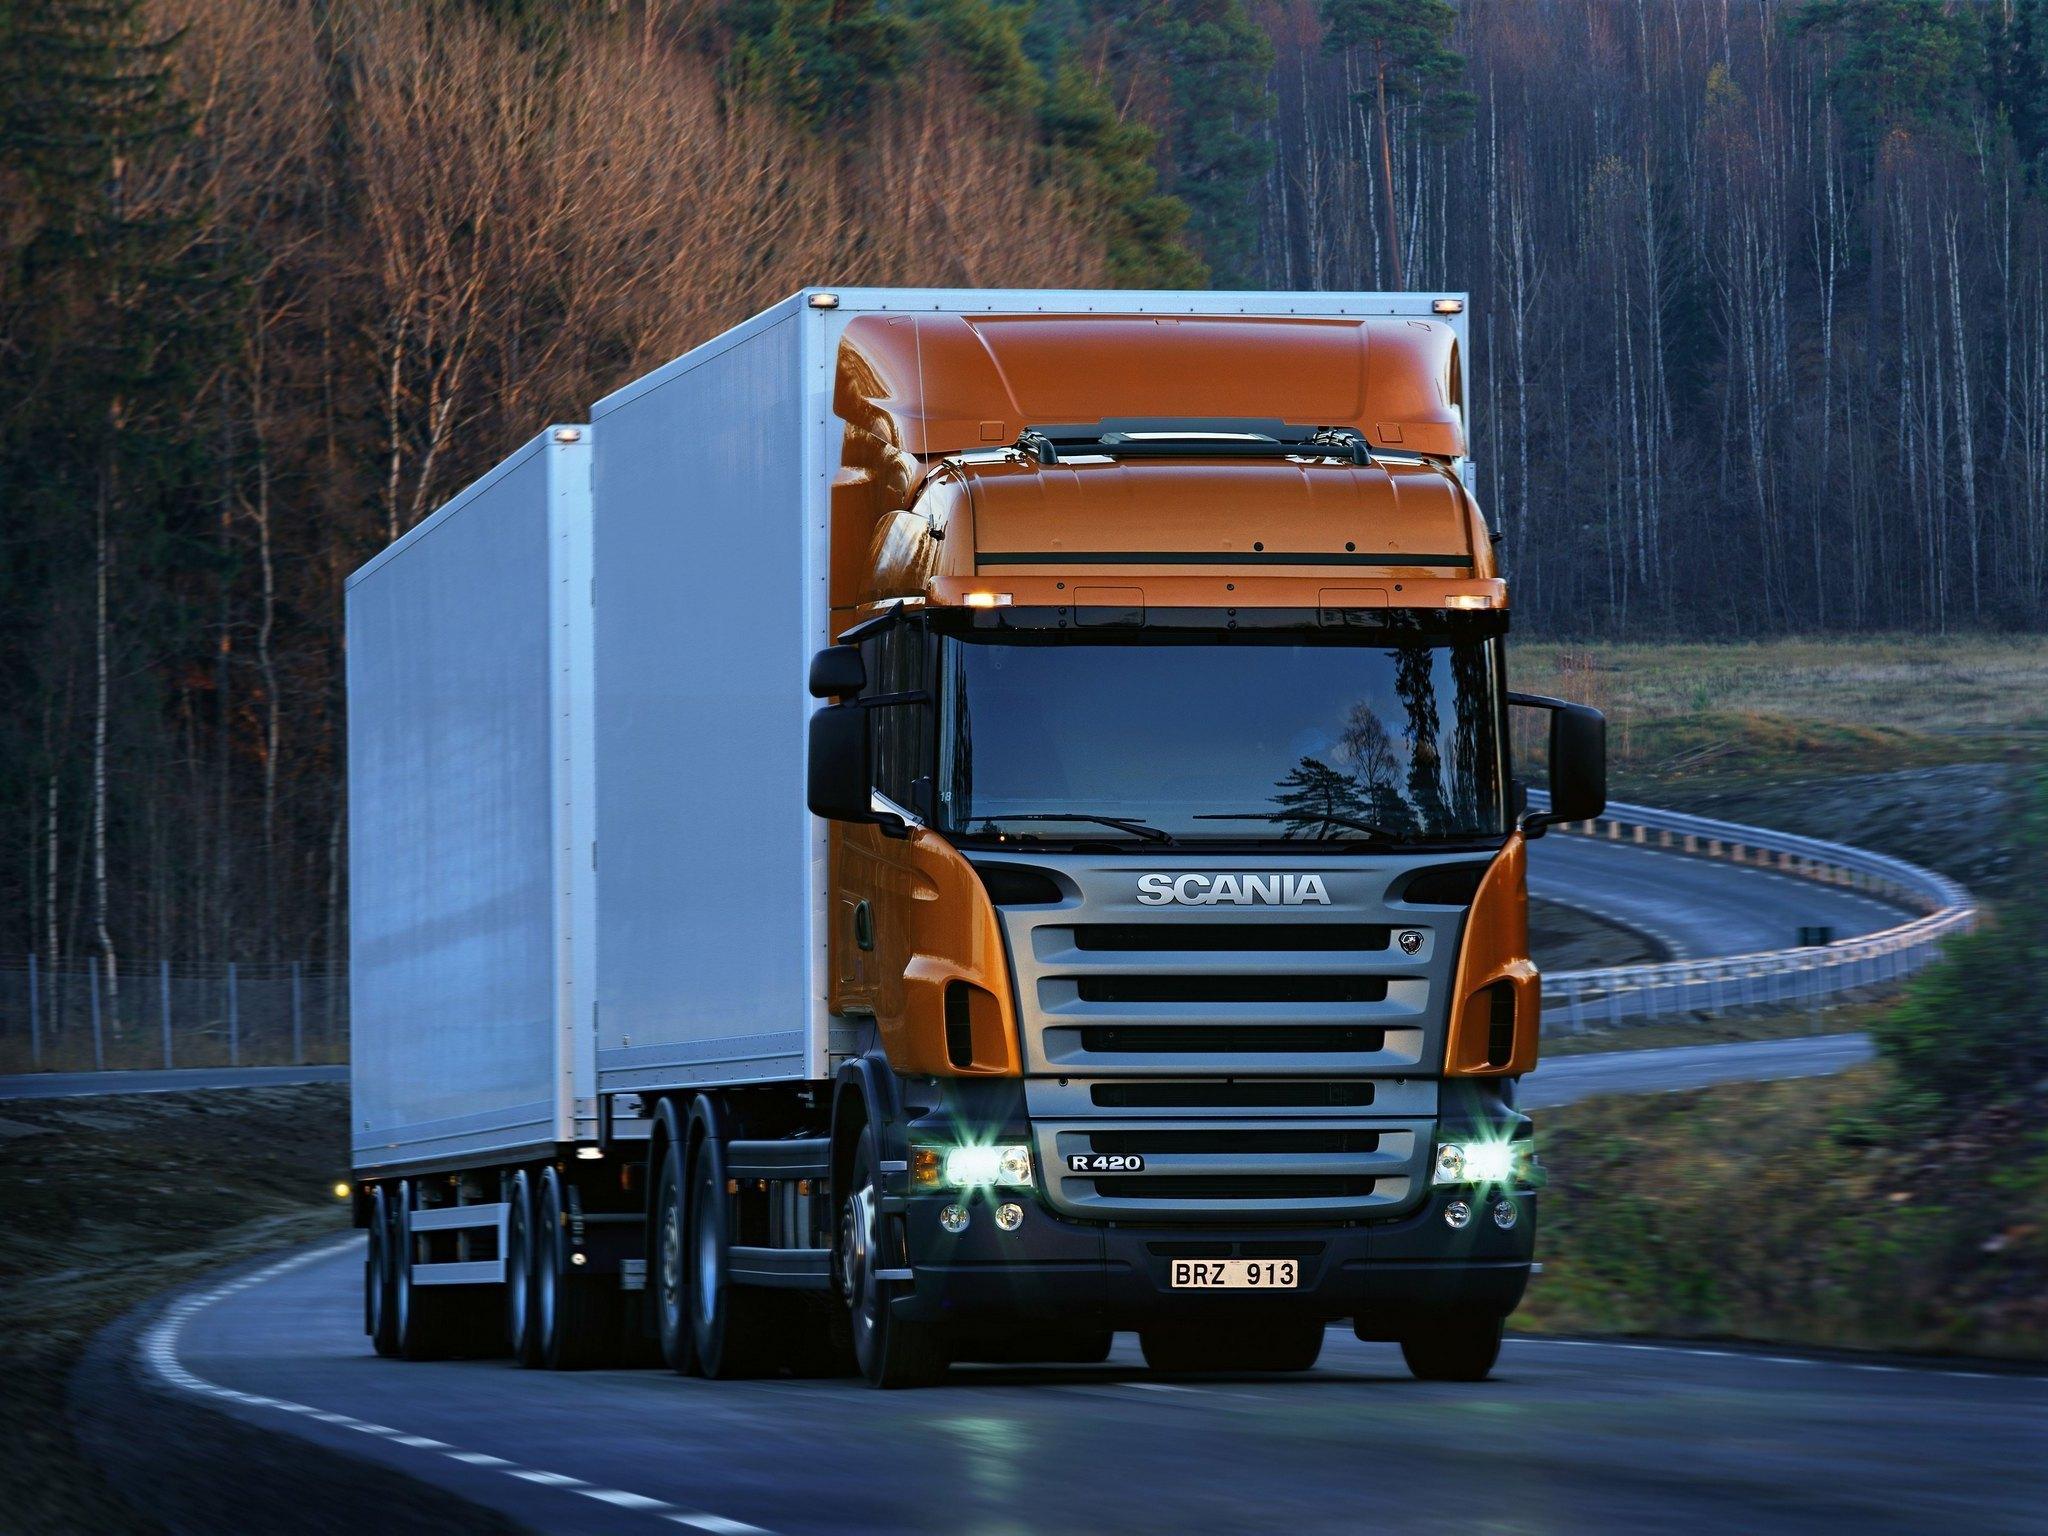 Wallpaper Scania Trucks Cars 2048x1536 Lorry Auto Automobile